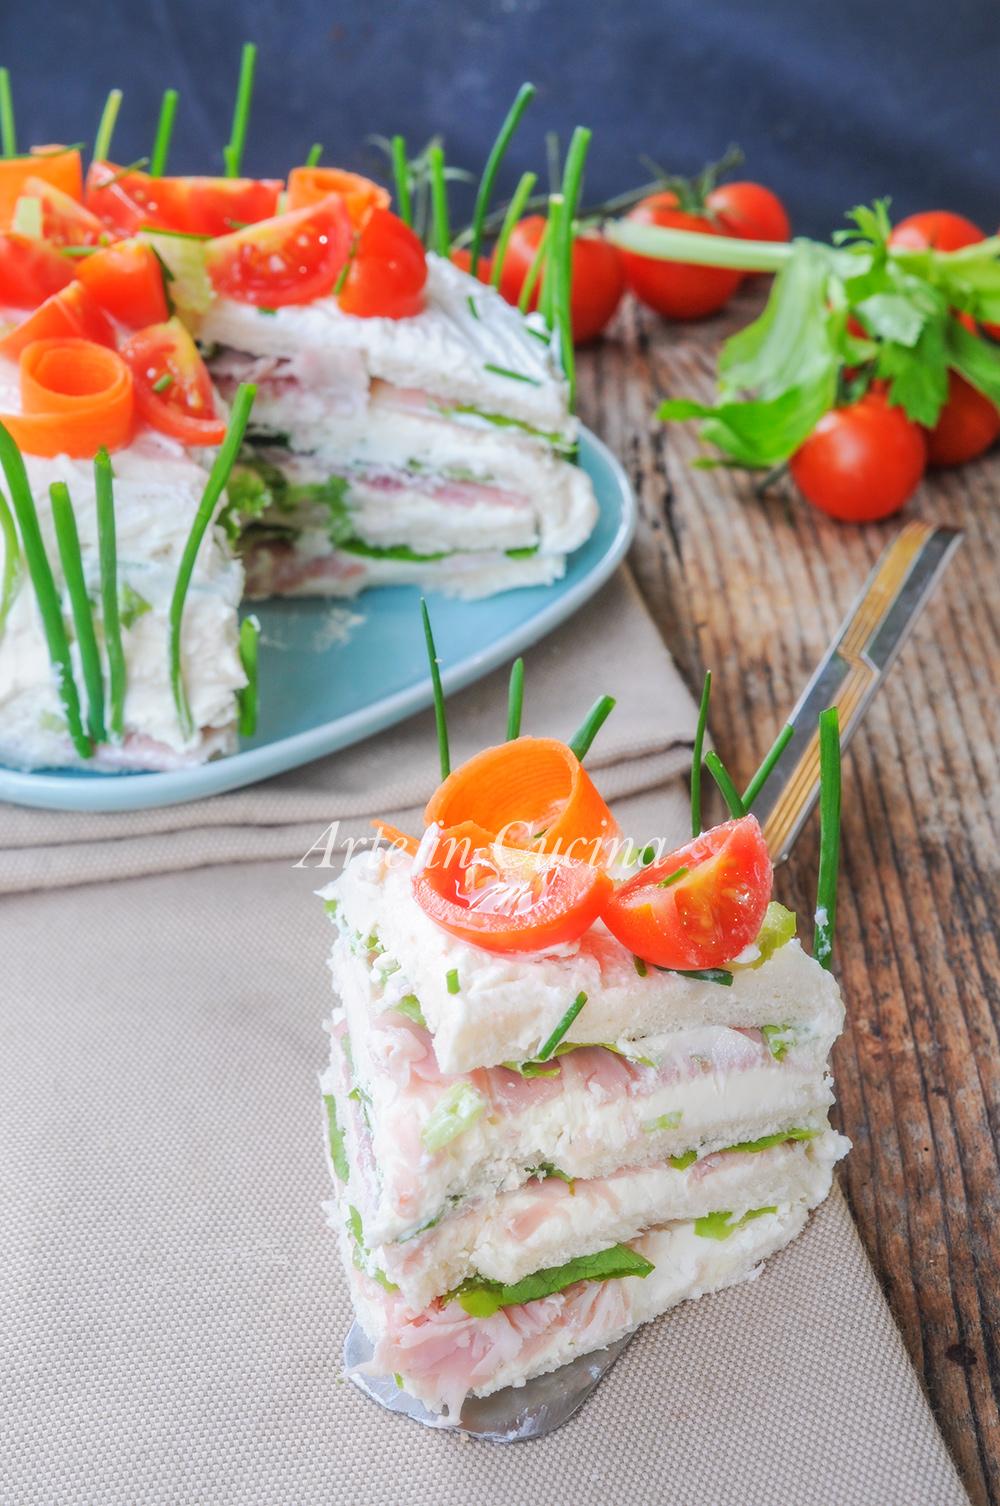 Torta tramezzino sandwich ricetta veloce antipasto vickyart arte in cucina